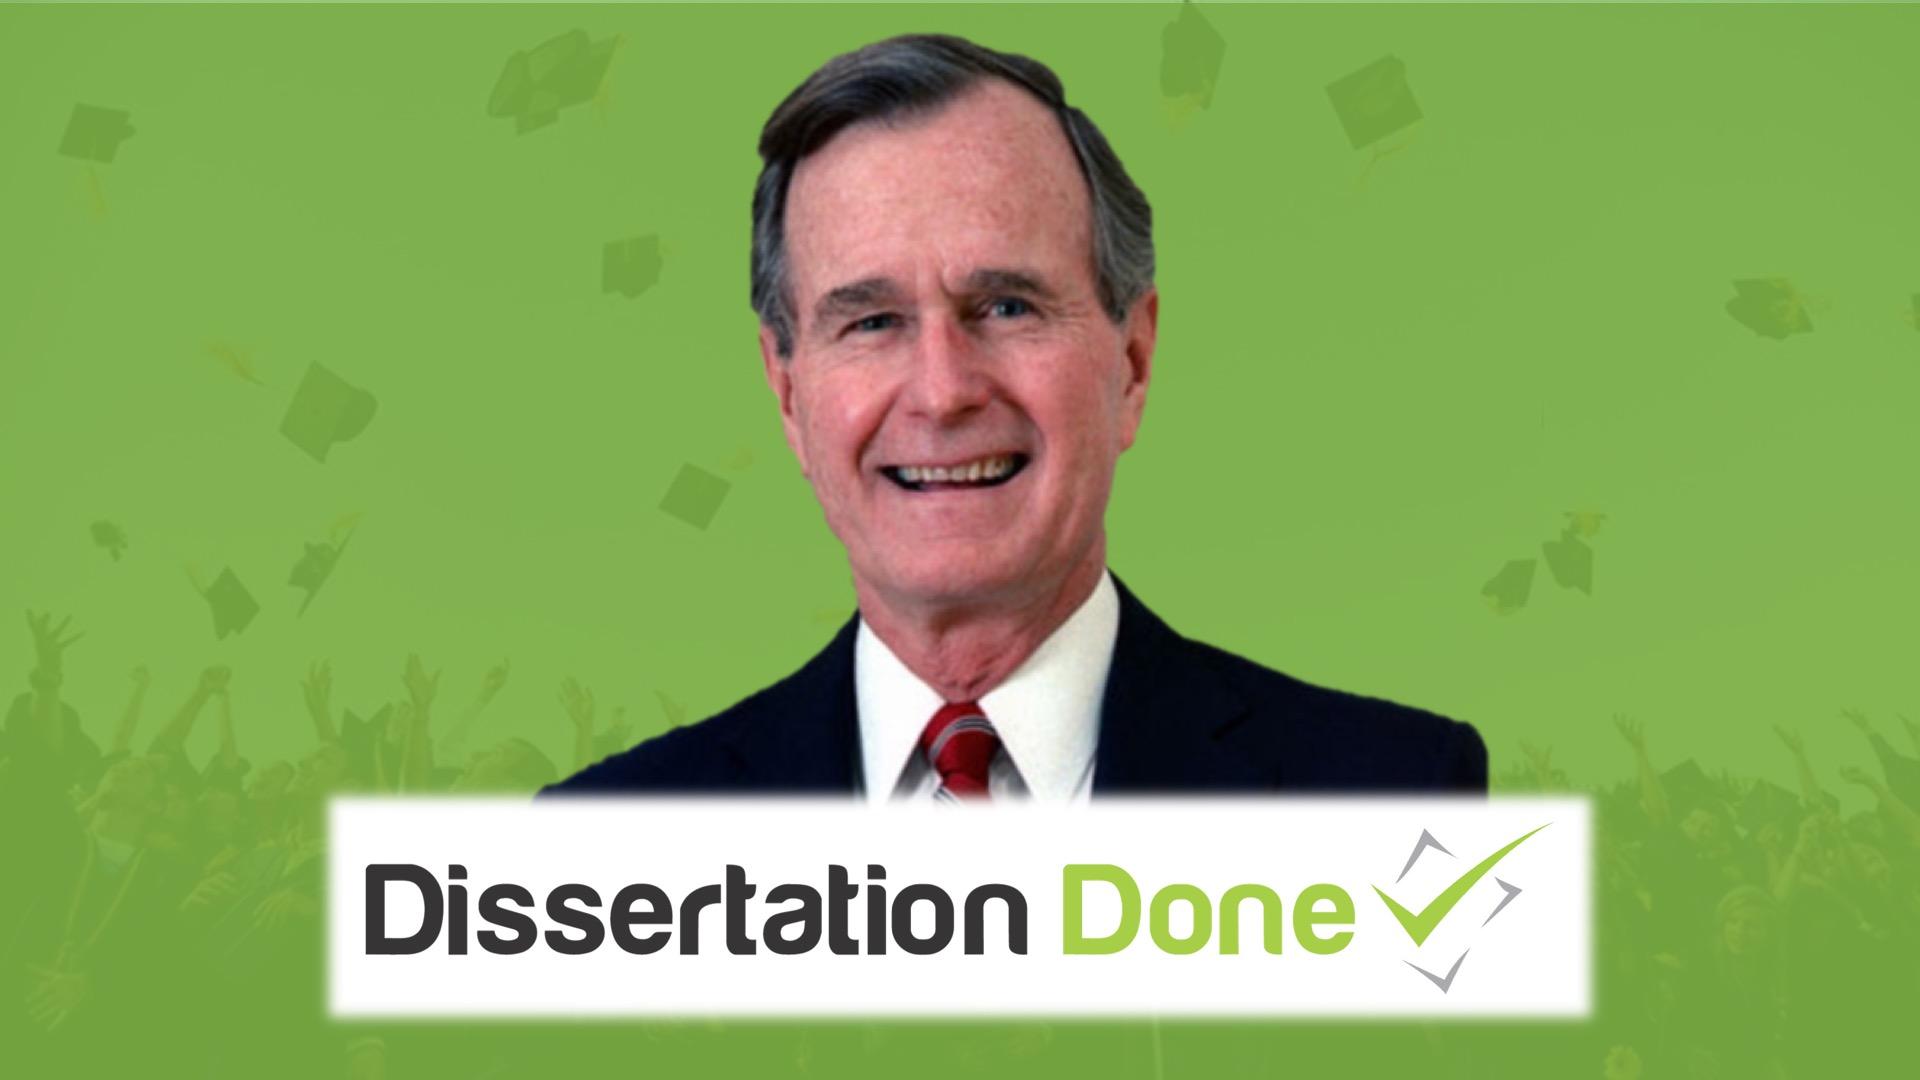 Dissertation and george bush